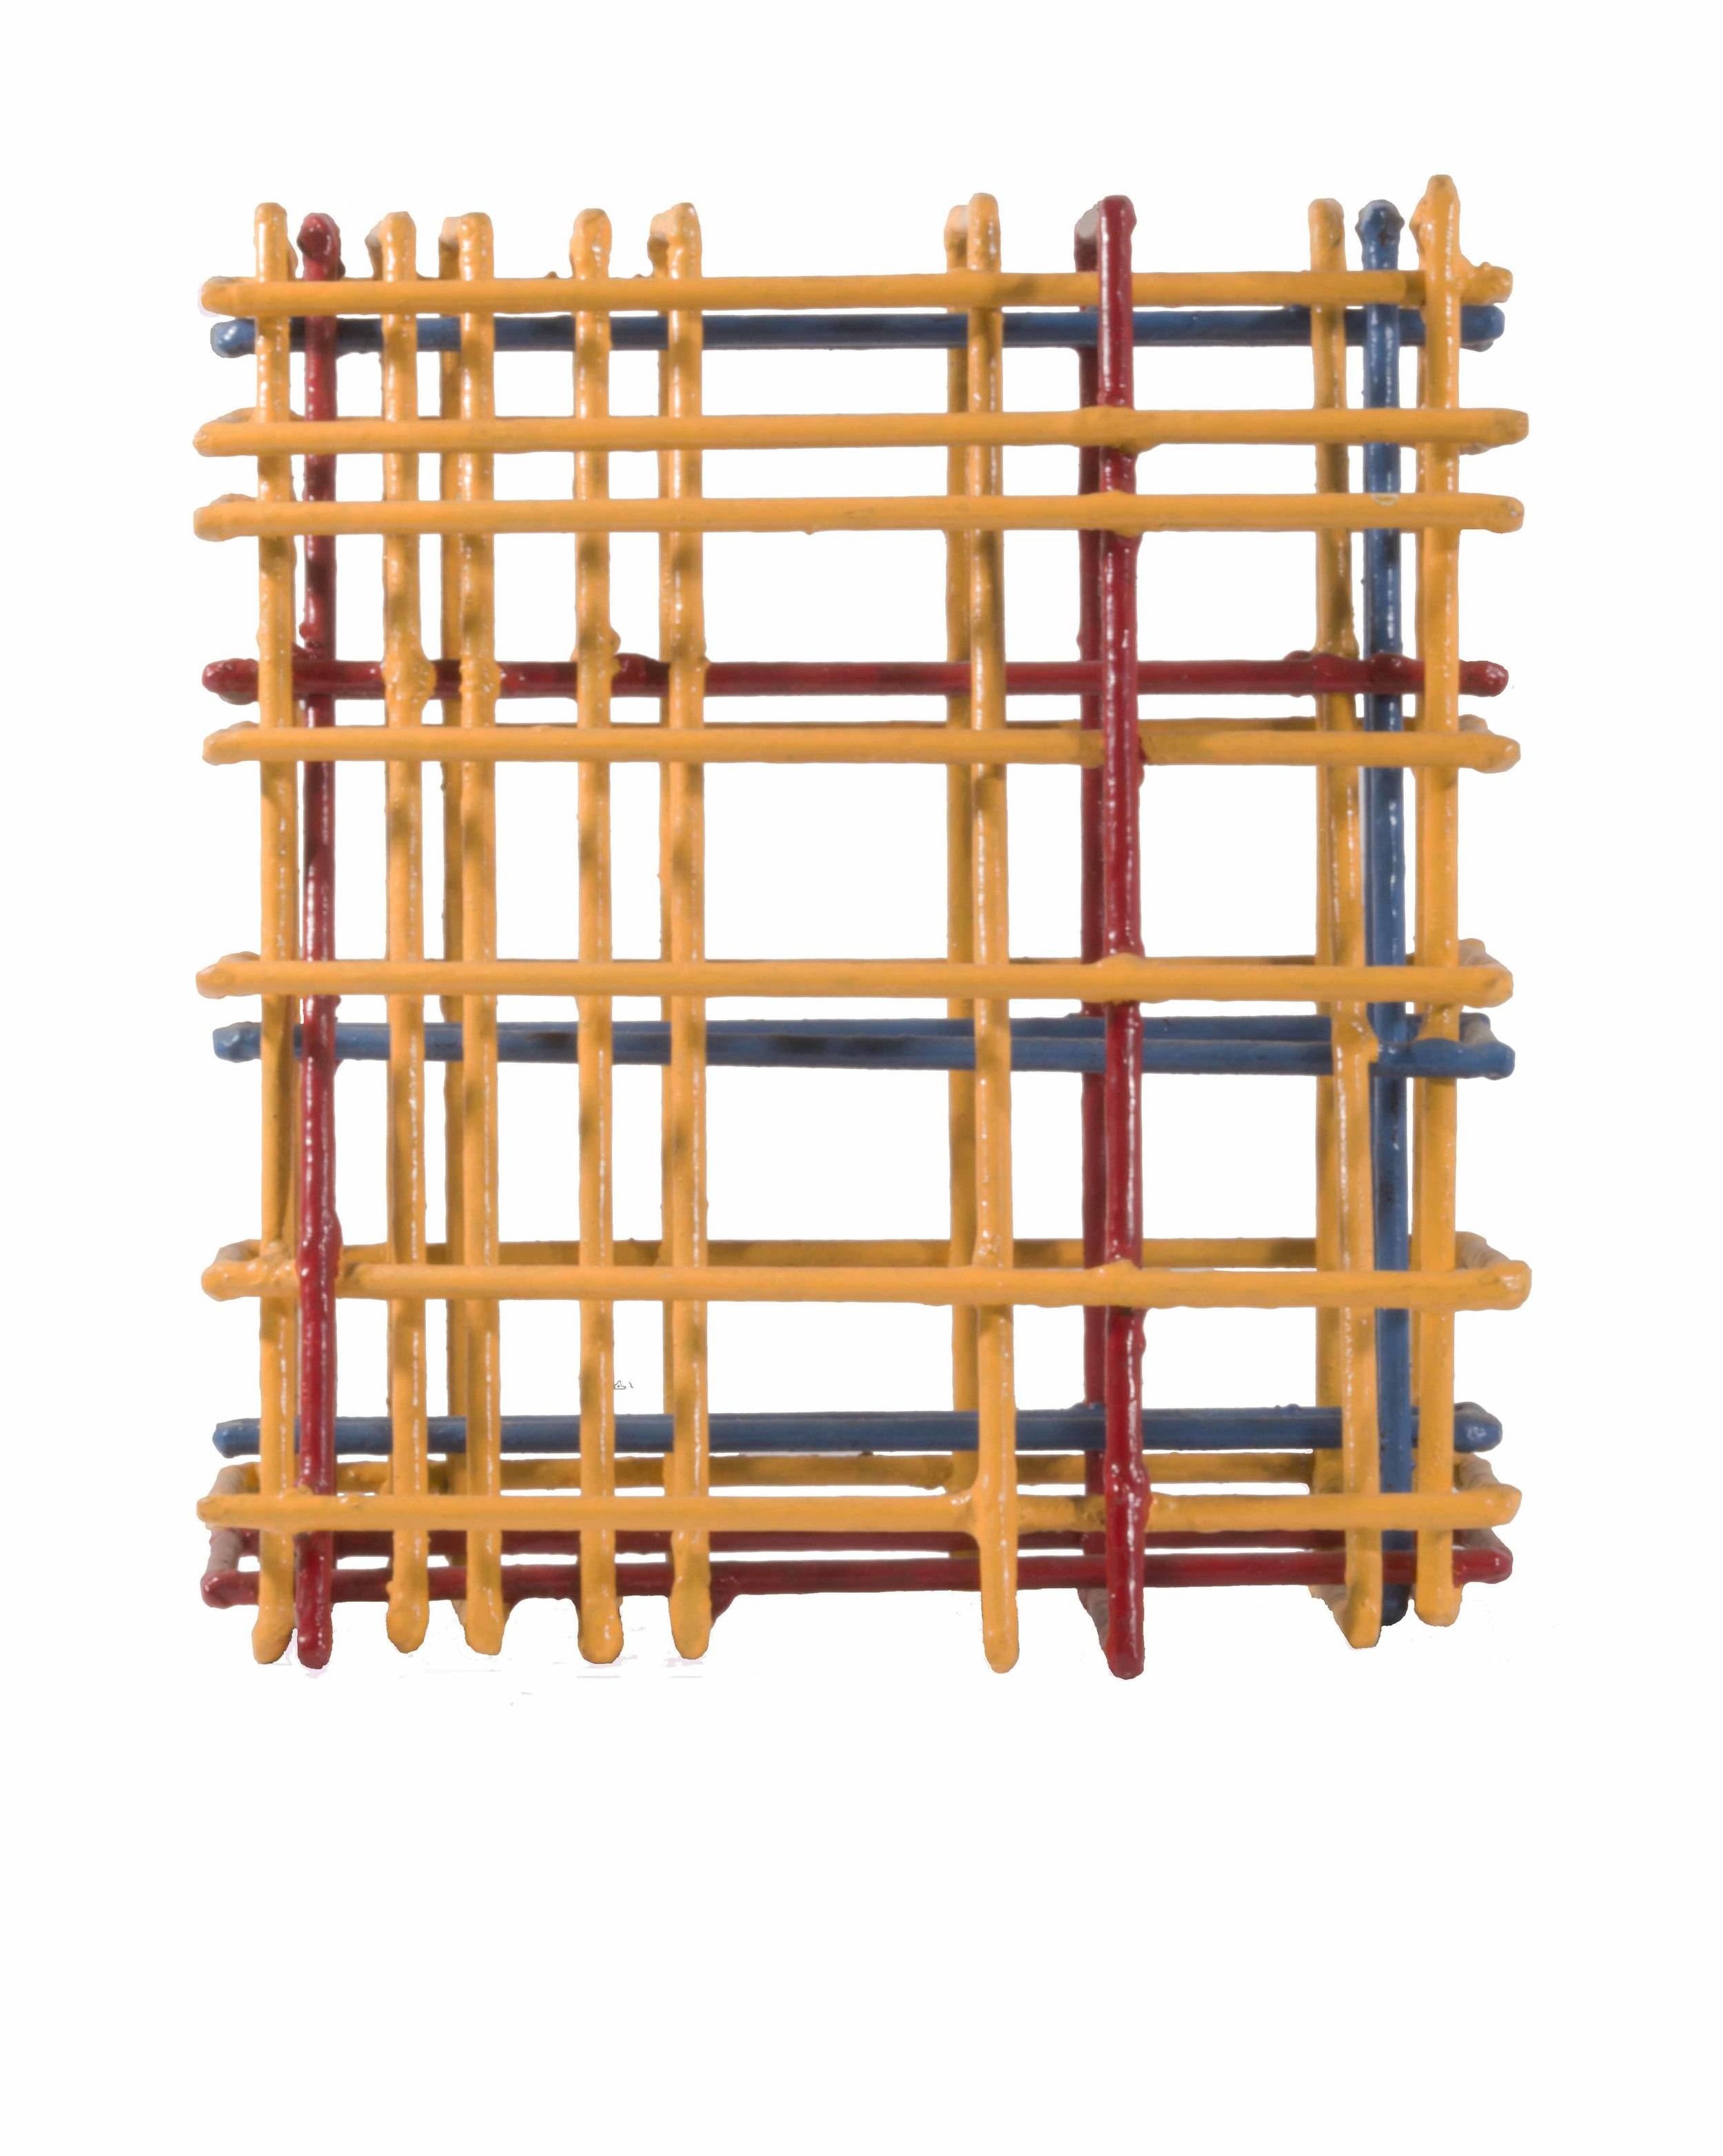 Mondrian Construction 5B, 1995-6